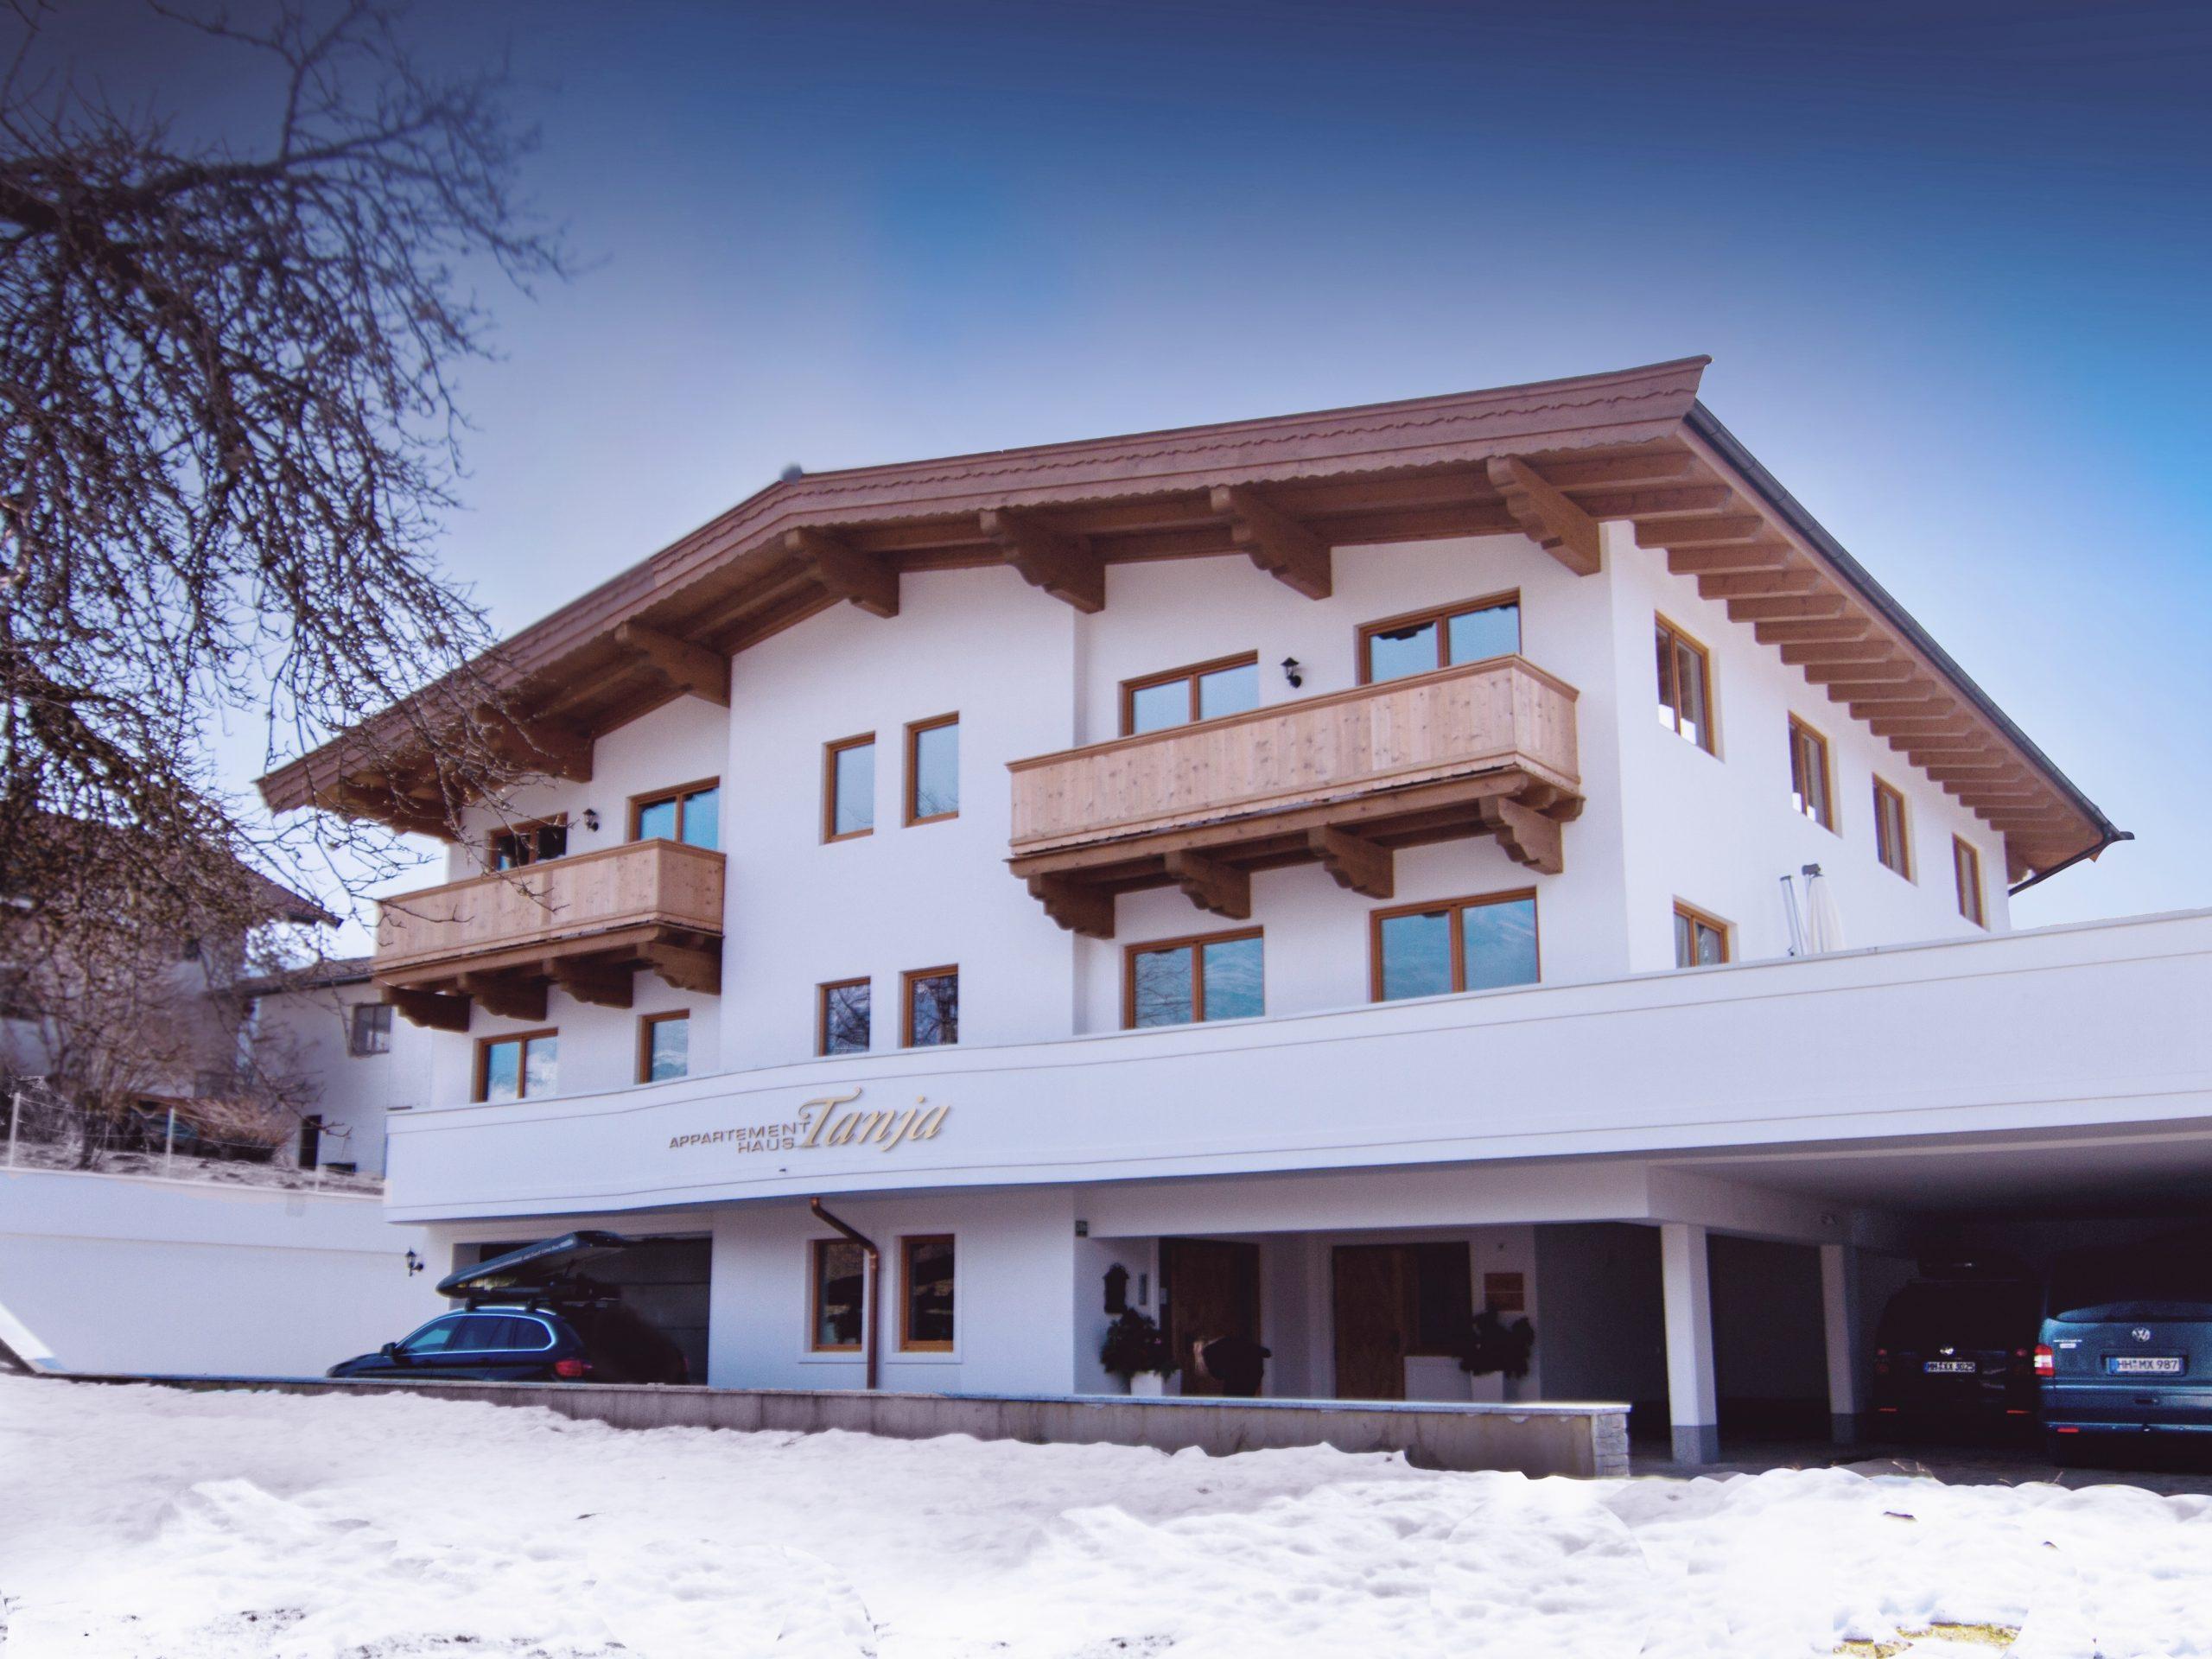 Appartement Tanja Superior - 4-6 personen